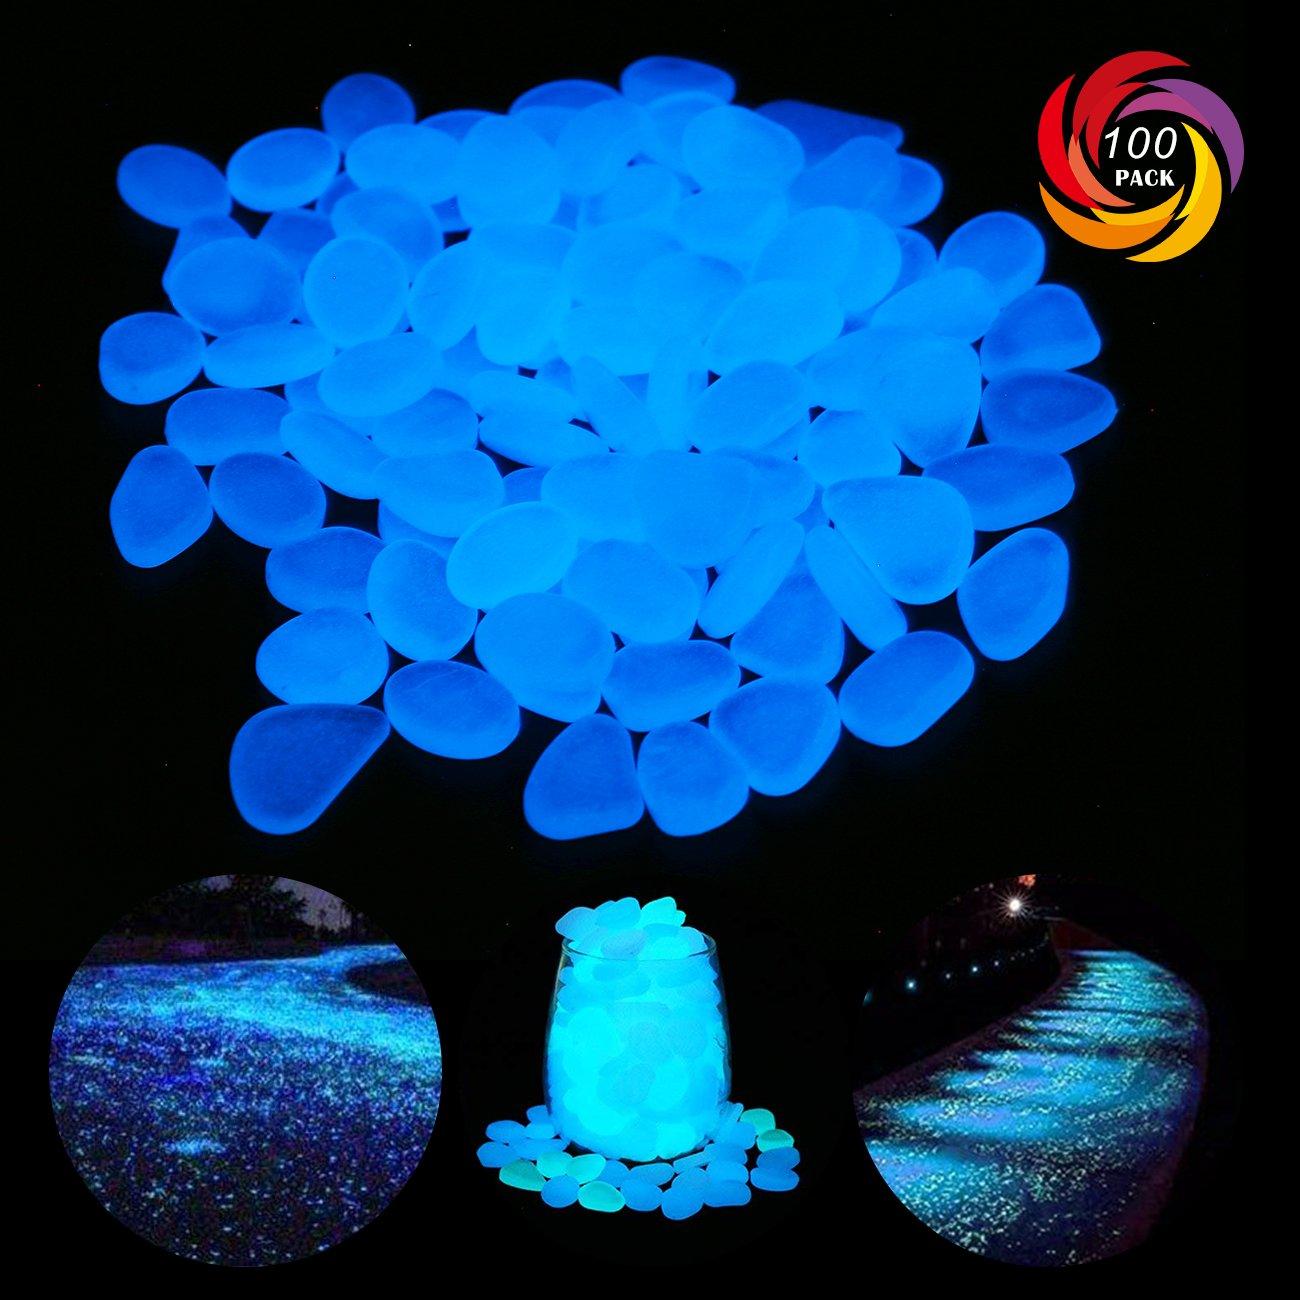 GeniusCells 2.2lb Glow in The Dark Garden Pebbles Glow Stones Rocks for Walkways Garden Path Patio Lawn Garden Yard Decor Luminous Stones